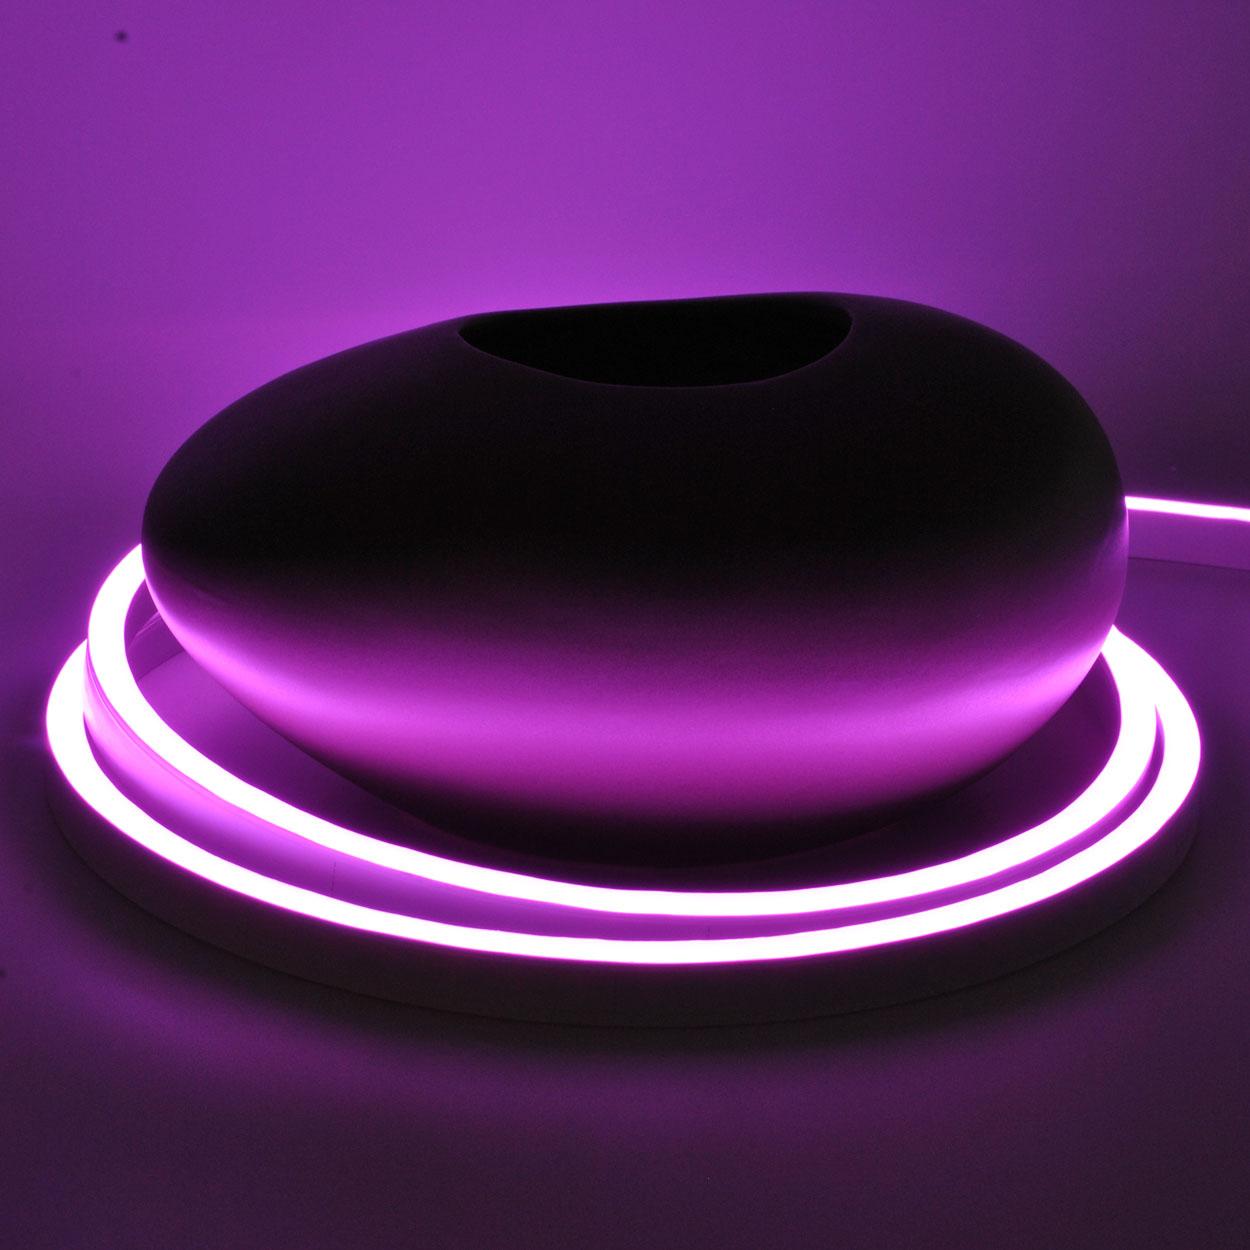 Neoled Top Rgb Linear Led Neon Strip Lightmoves